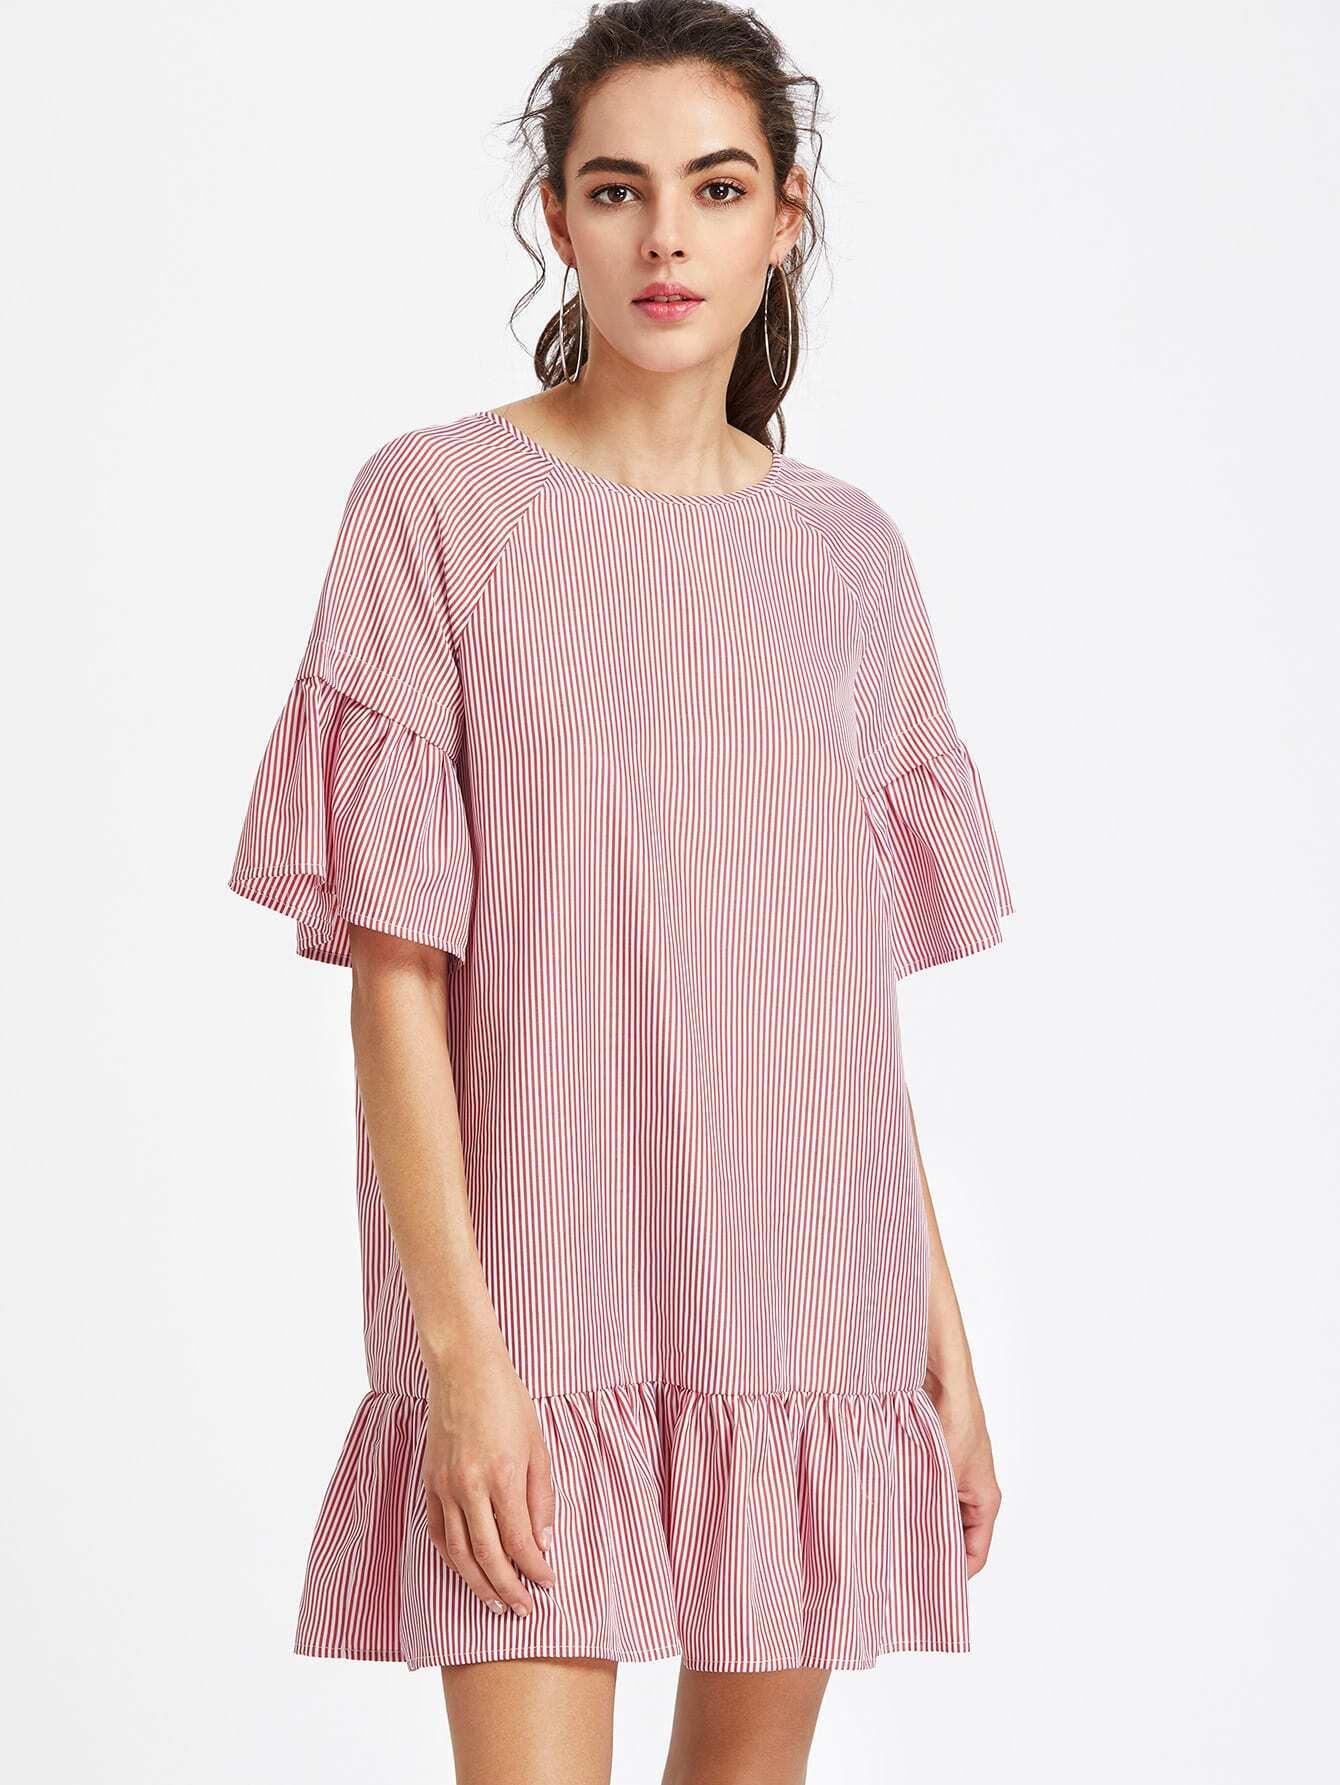 Raglan Sleeve Crisscross V Back Striped Ruffle Dress